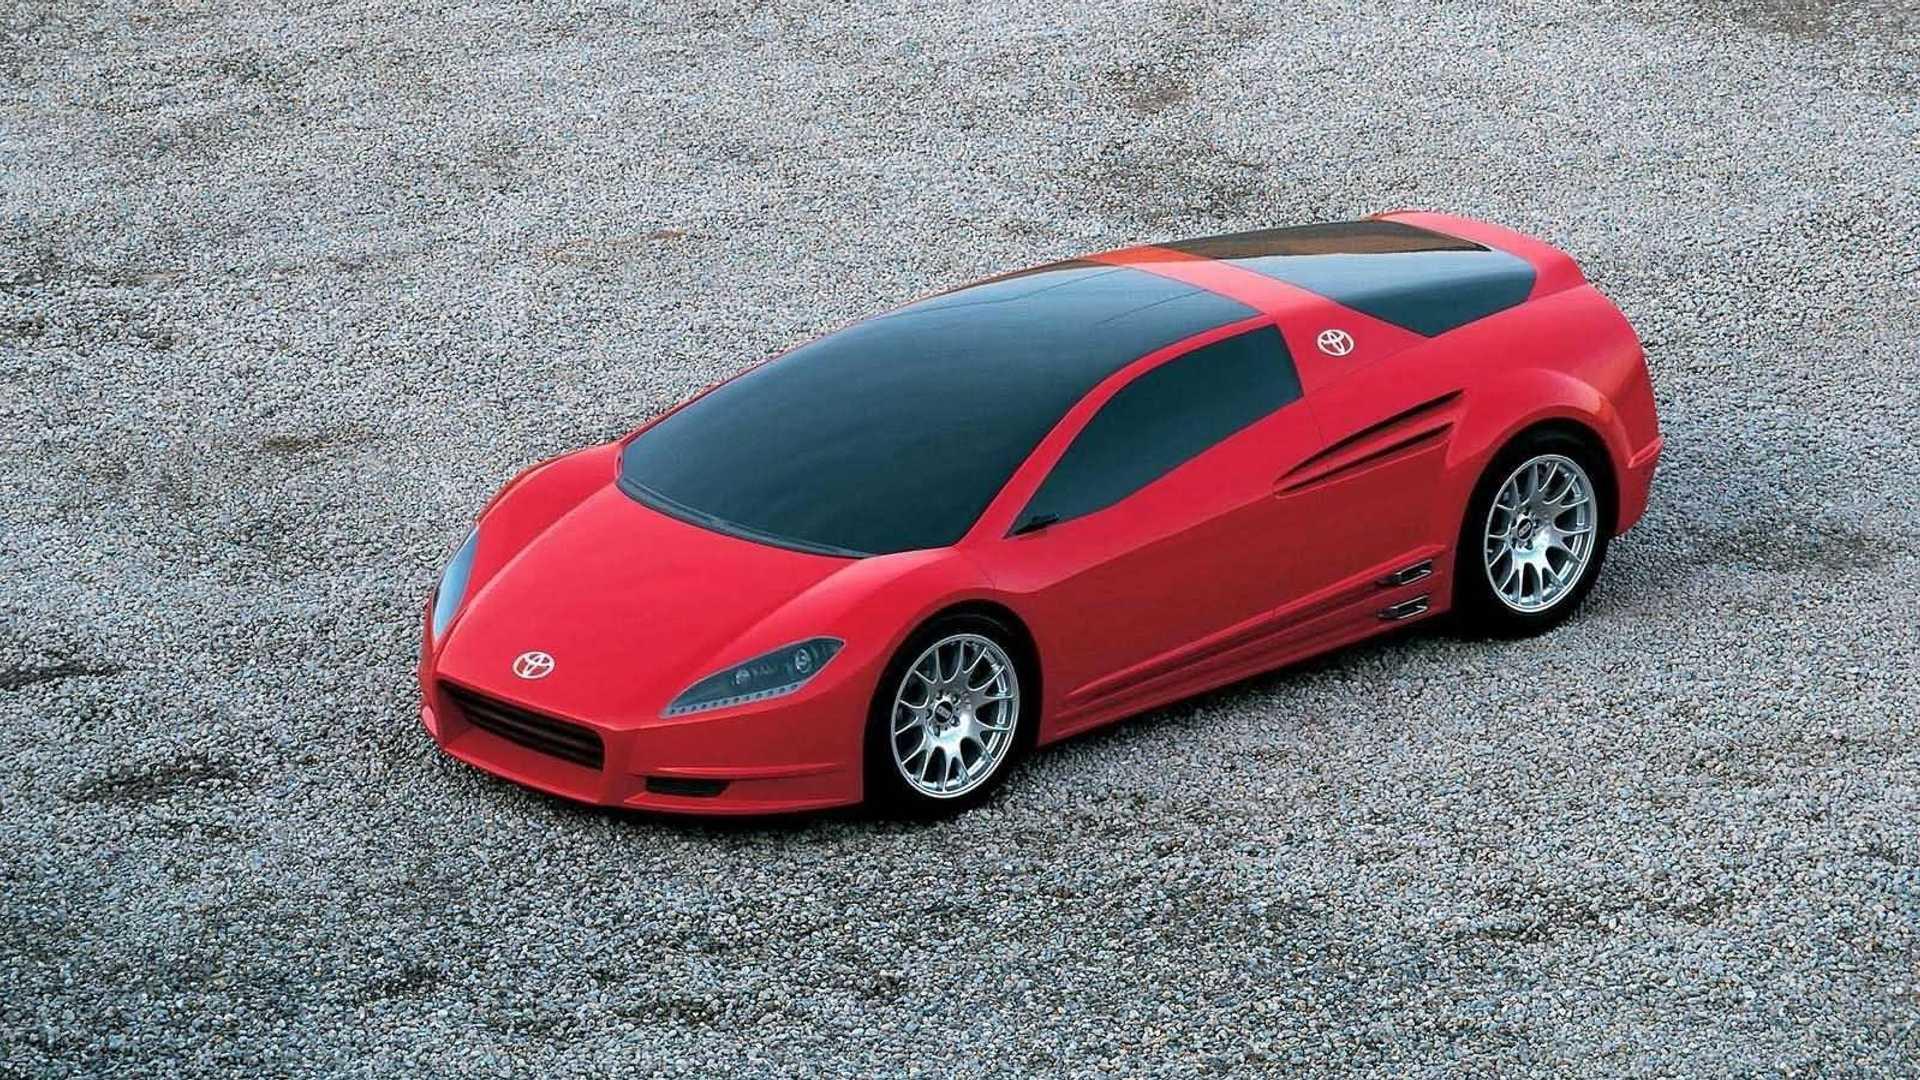 Toyota-Alessandro-Volta-concept-2004-5